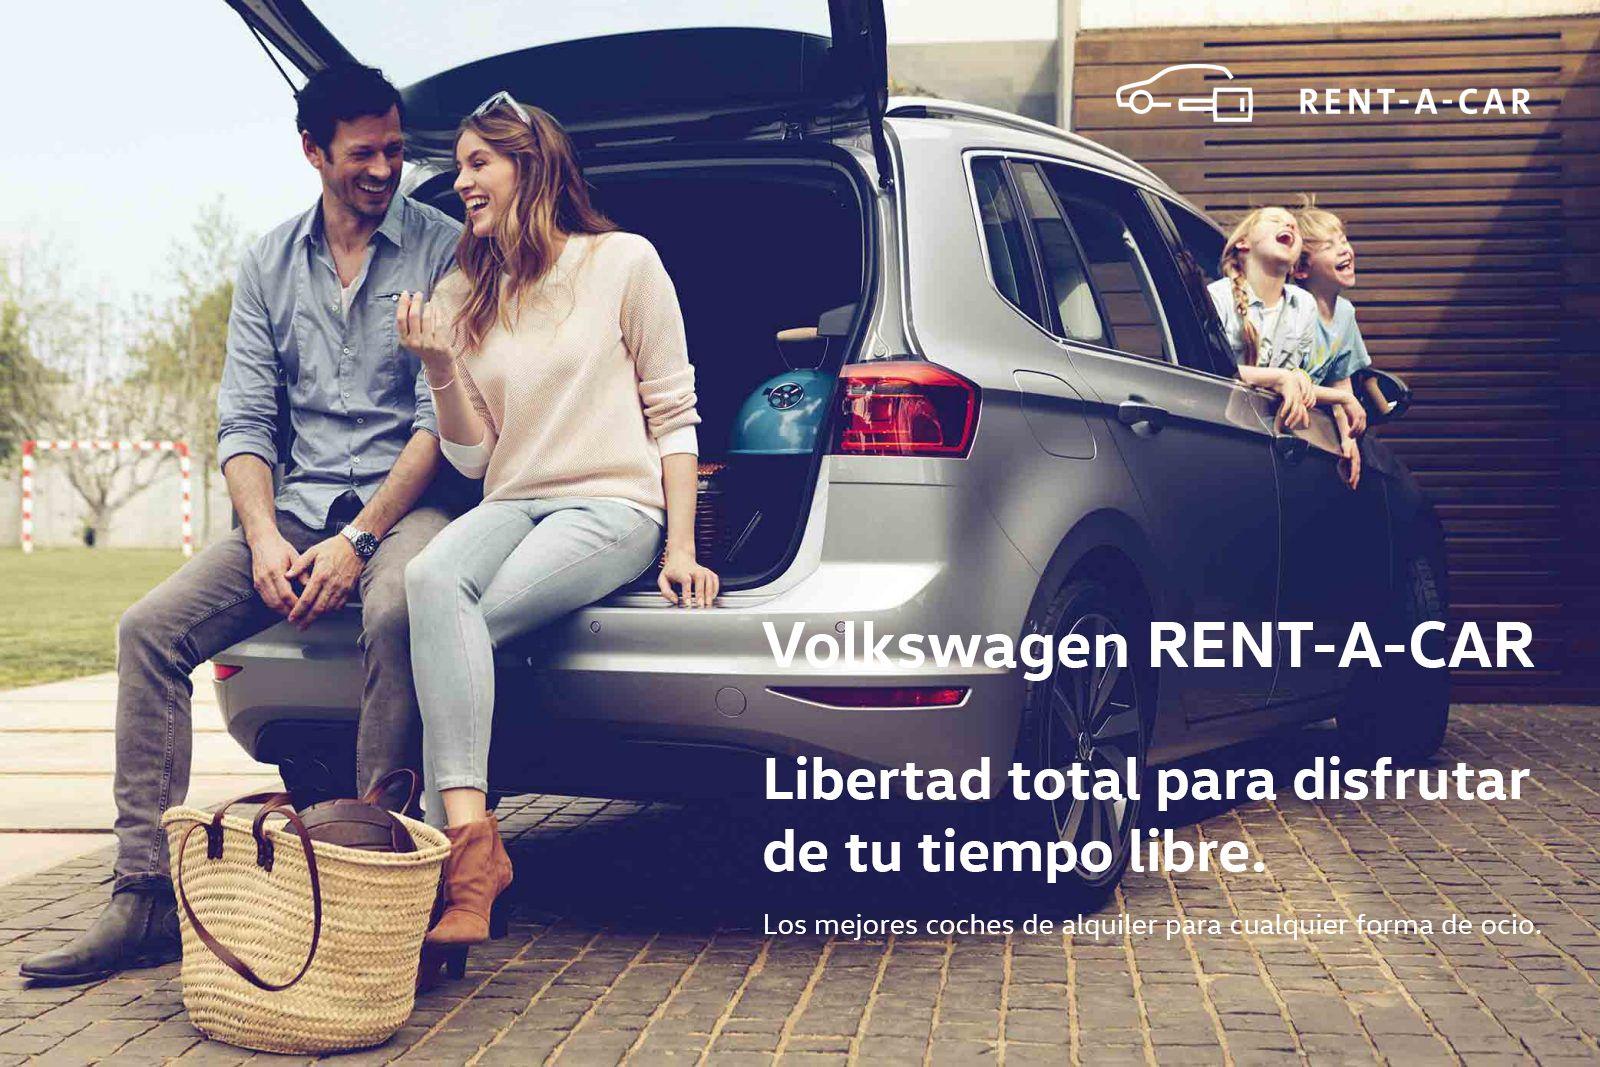 Un nuevo concepto de Rent-a-Car llega a Almeria.